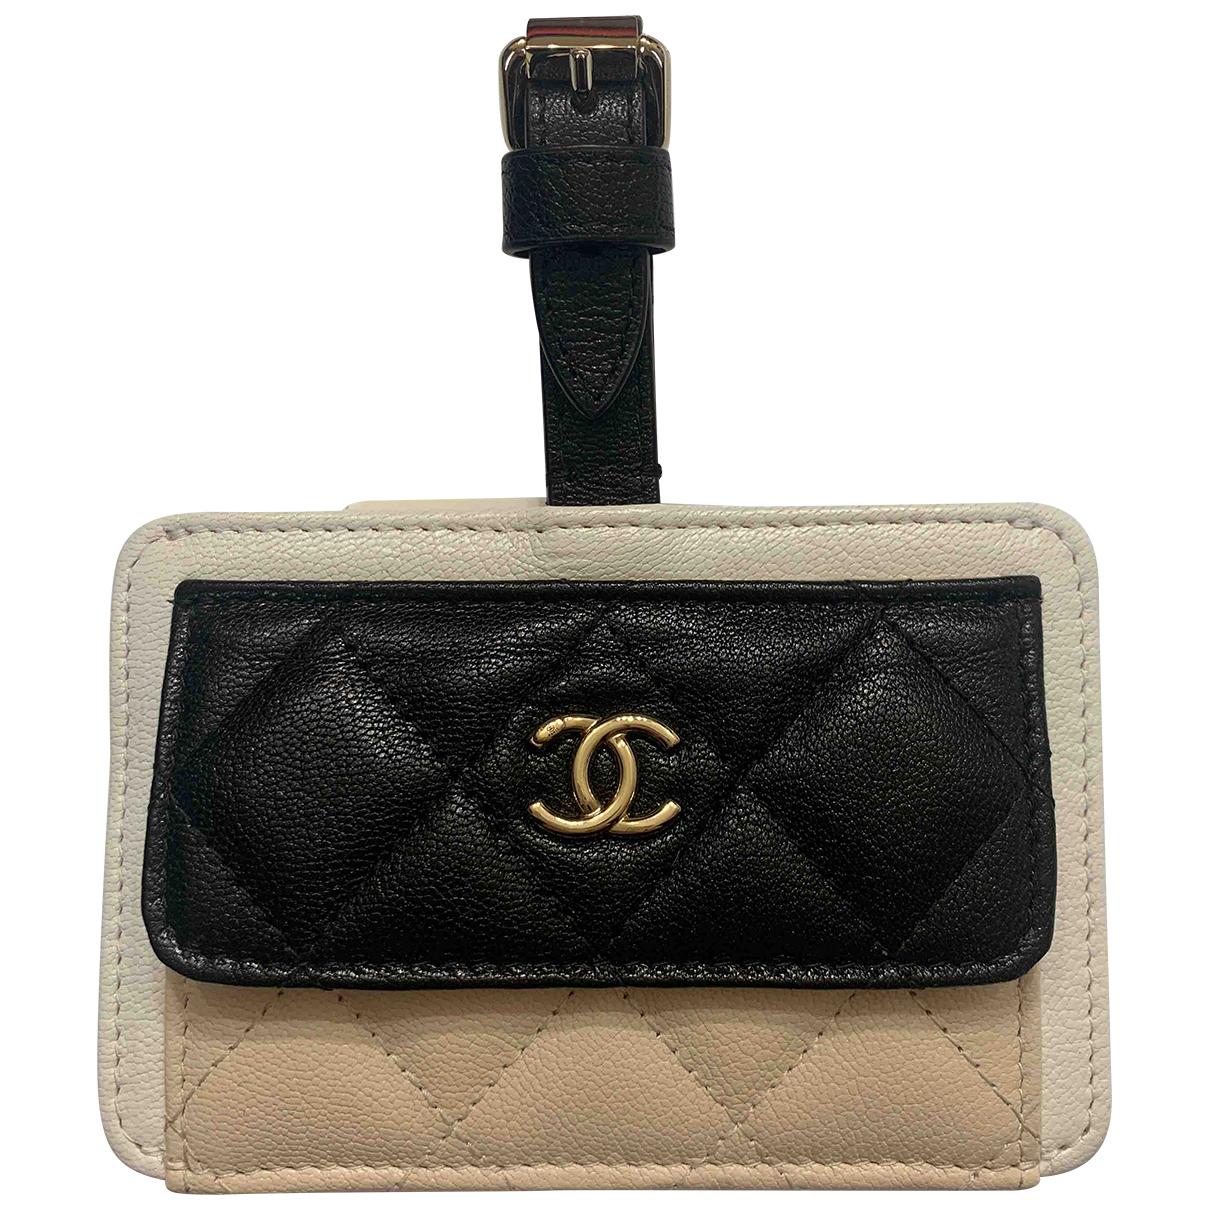 Chanel Timeless/Classique Multicolour Leather Purses, wallet & cases for Women N